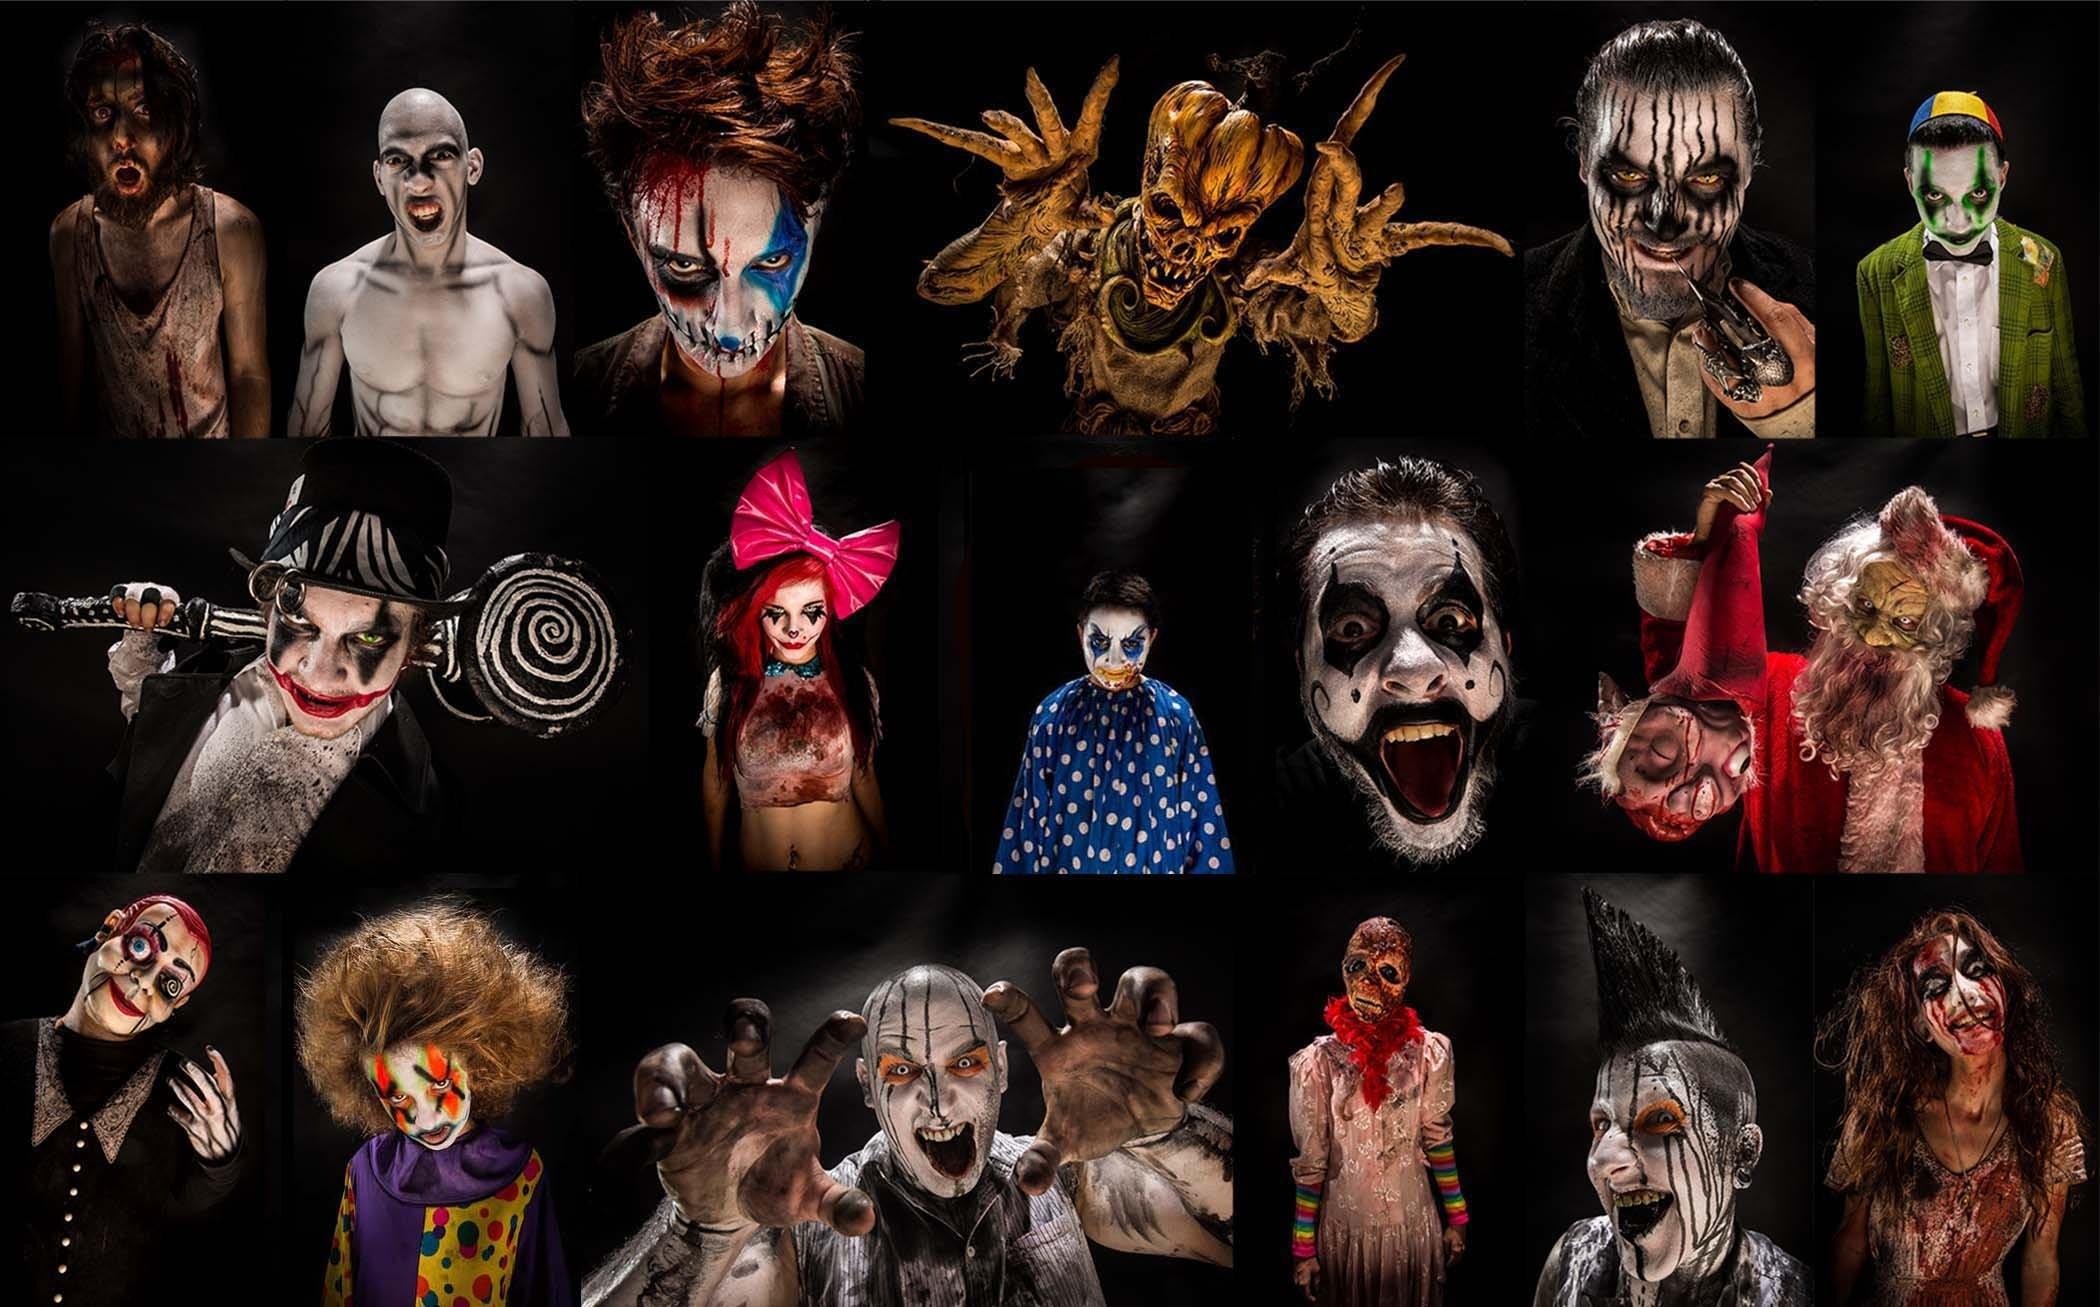 Dark Monster Halloween Horror Evil Blood Collage Poster Wallpaper At Dark  Wallpapers